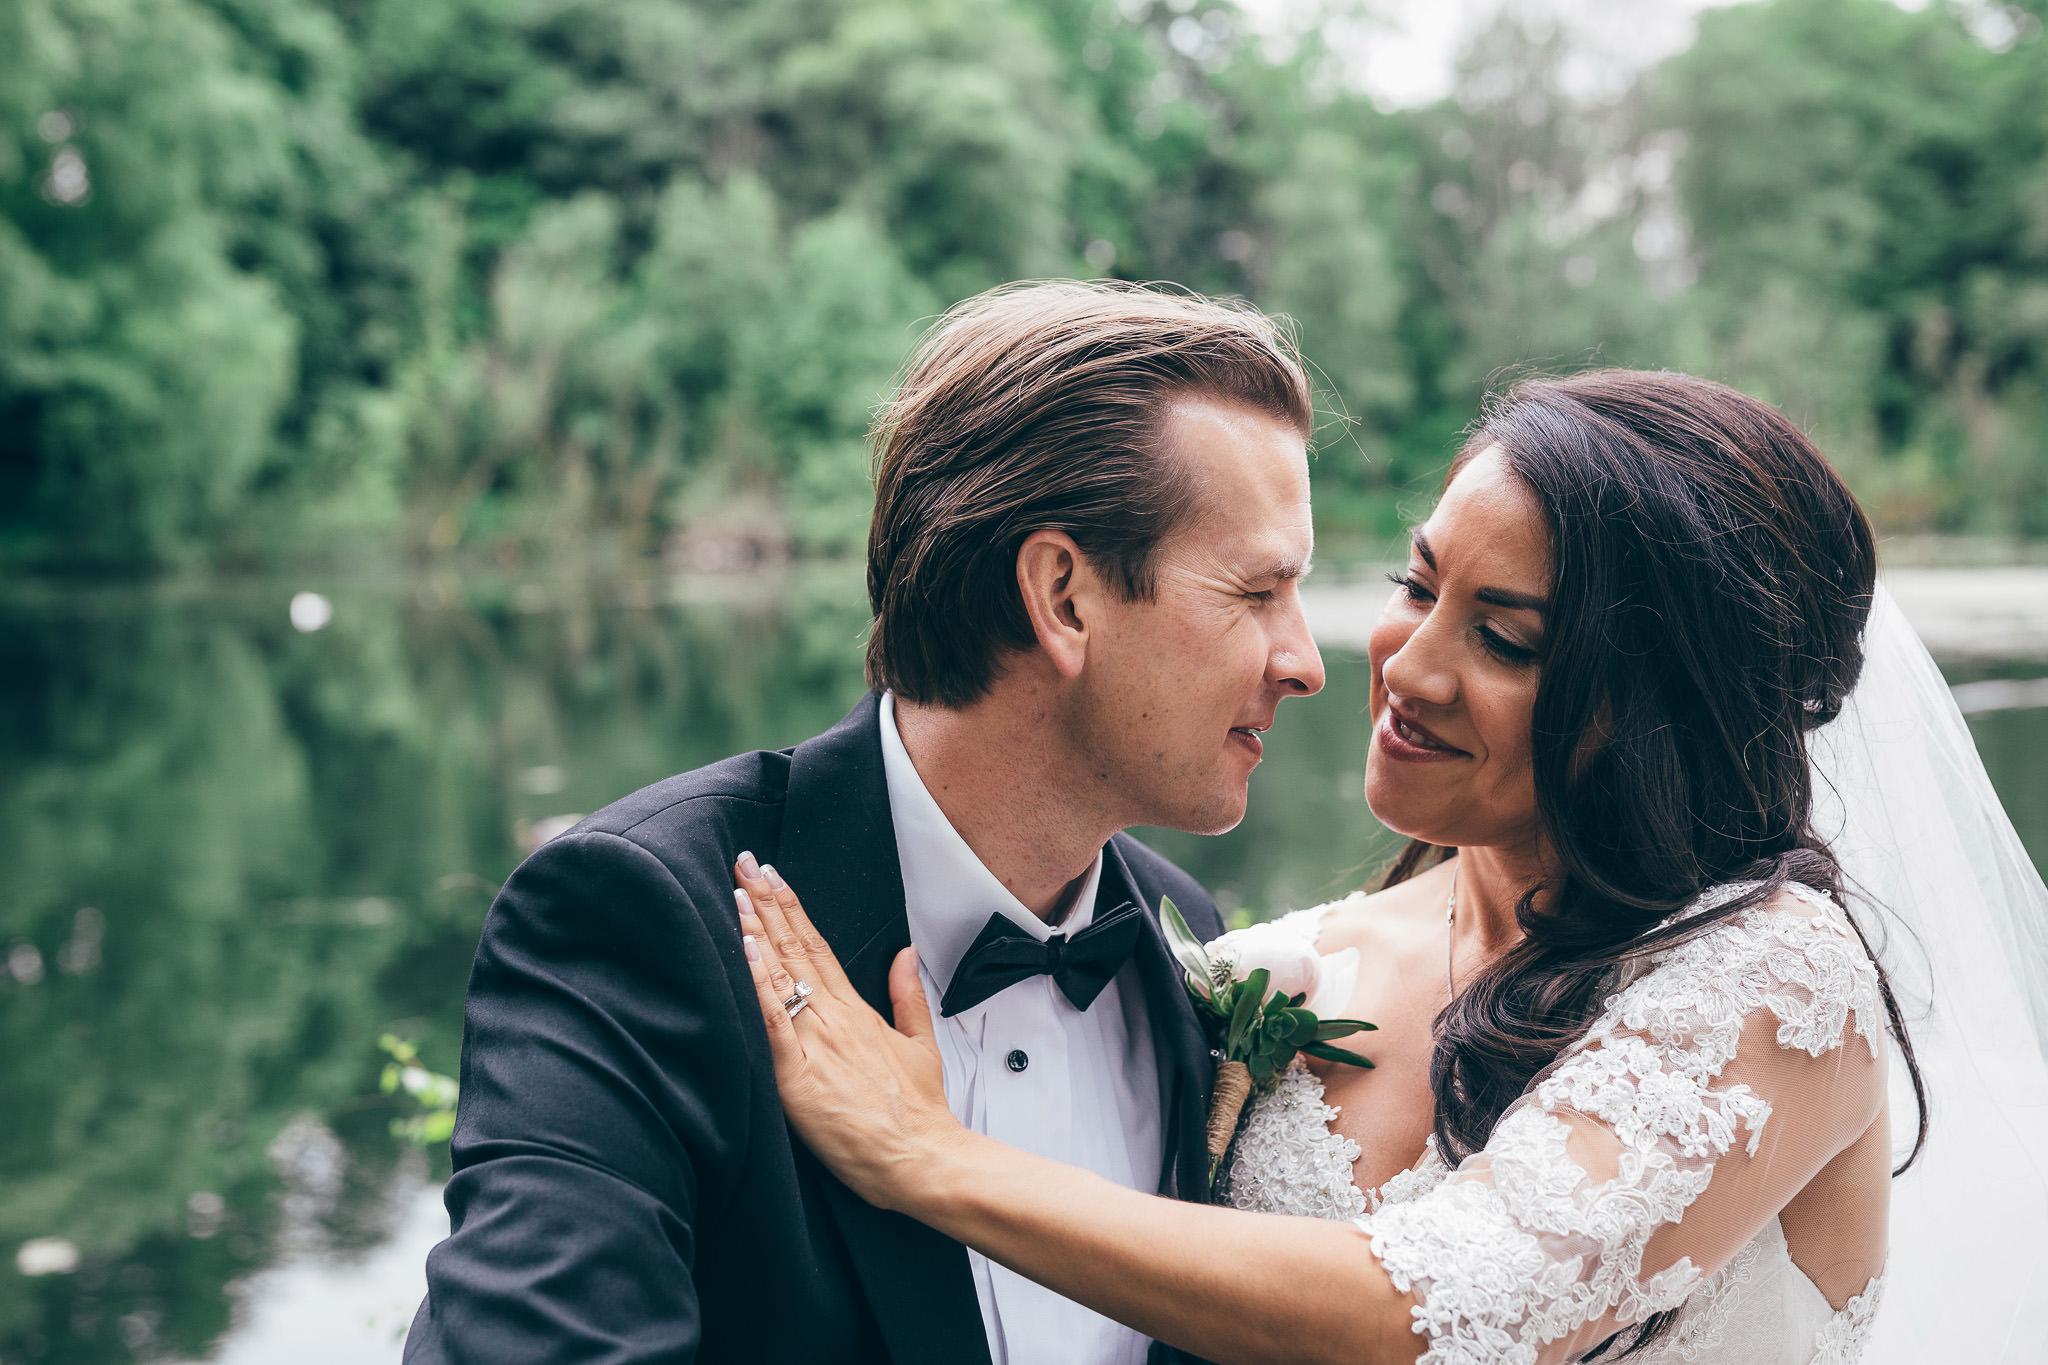 Wedding+Photographer+Norway+Bryllupsfotograf+Casey+Arneson+MK-167.jpg